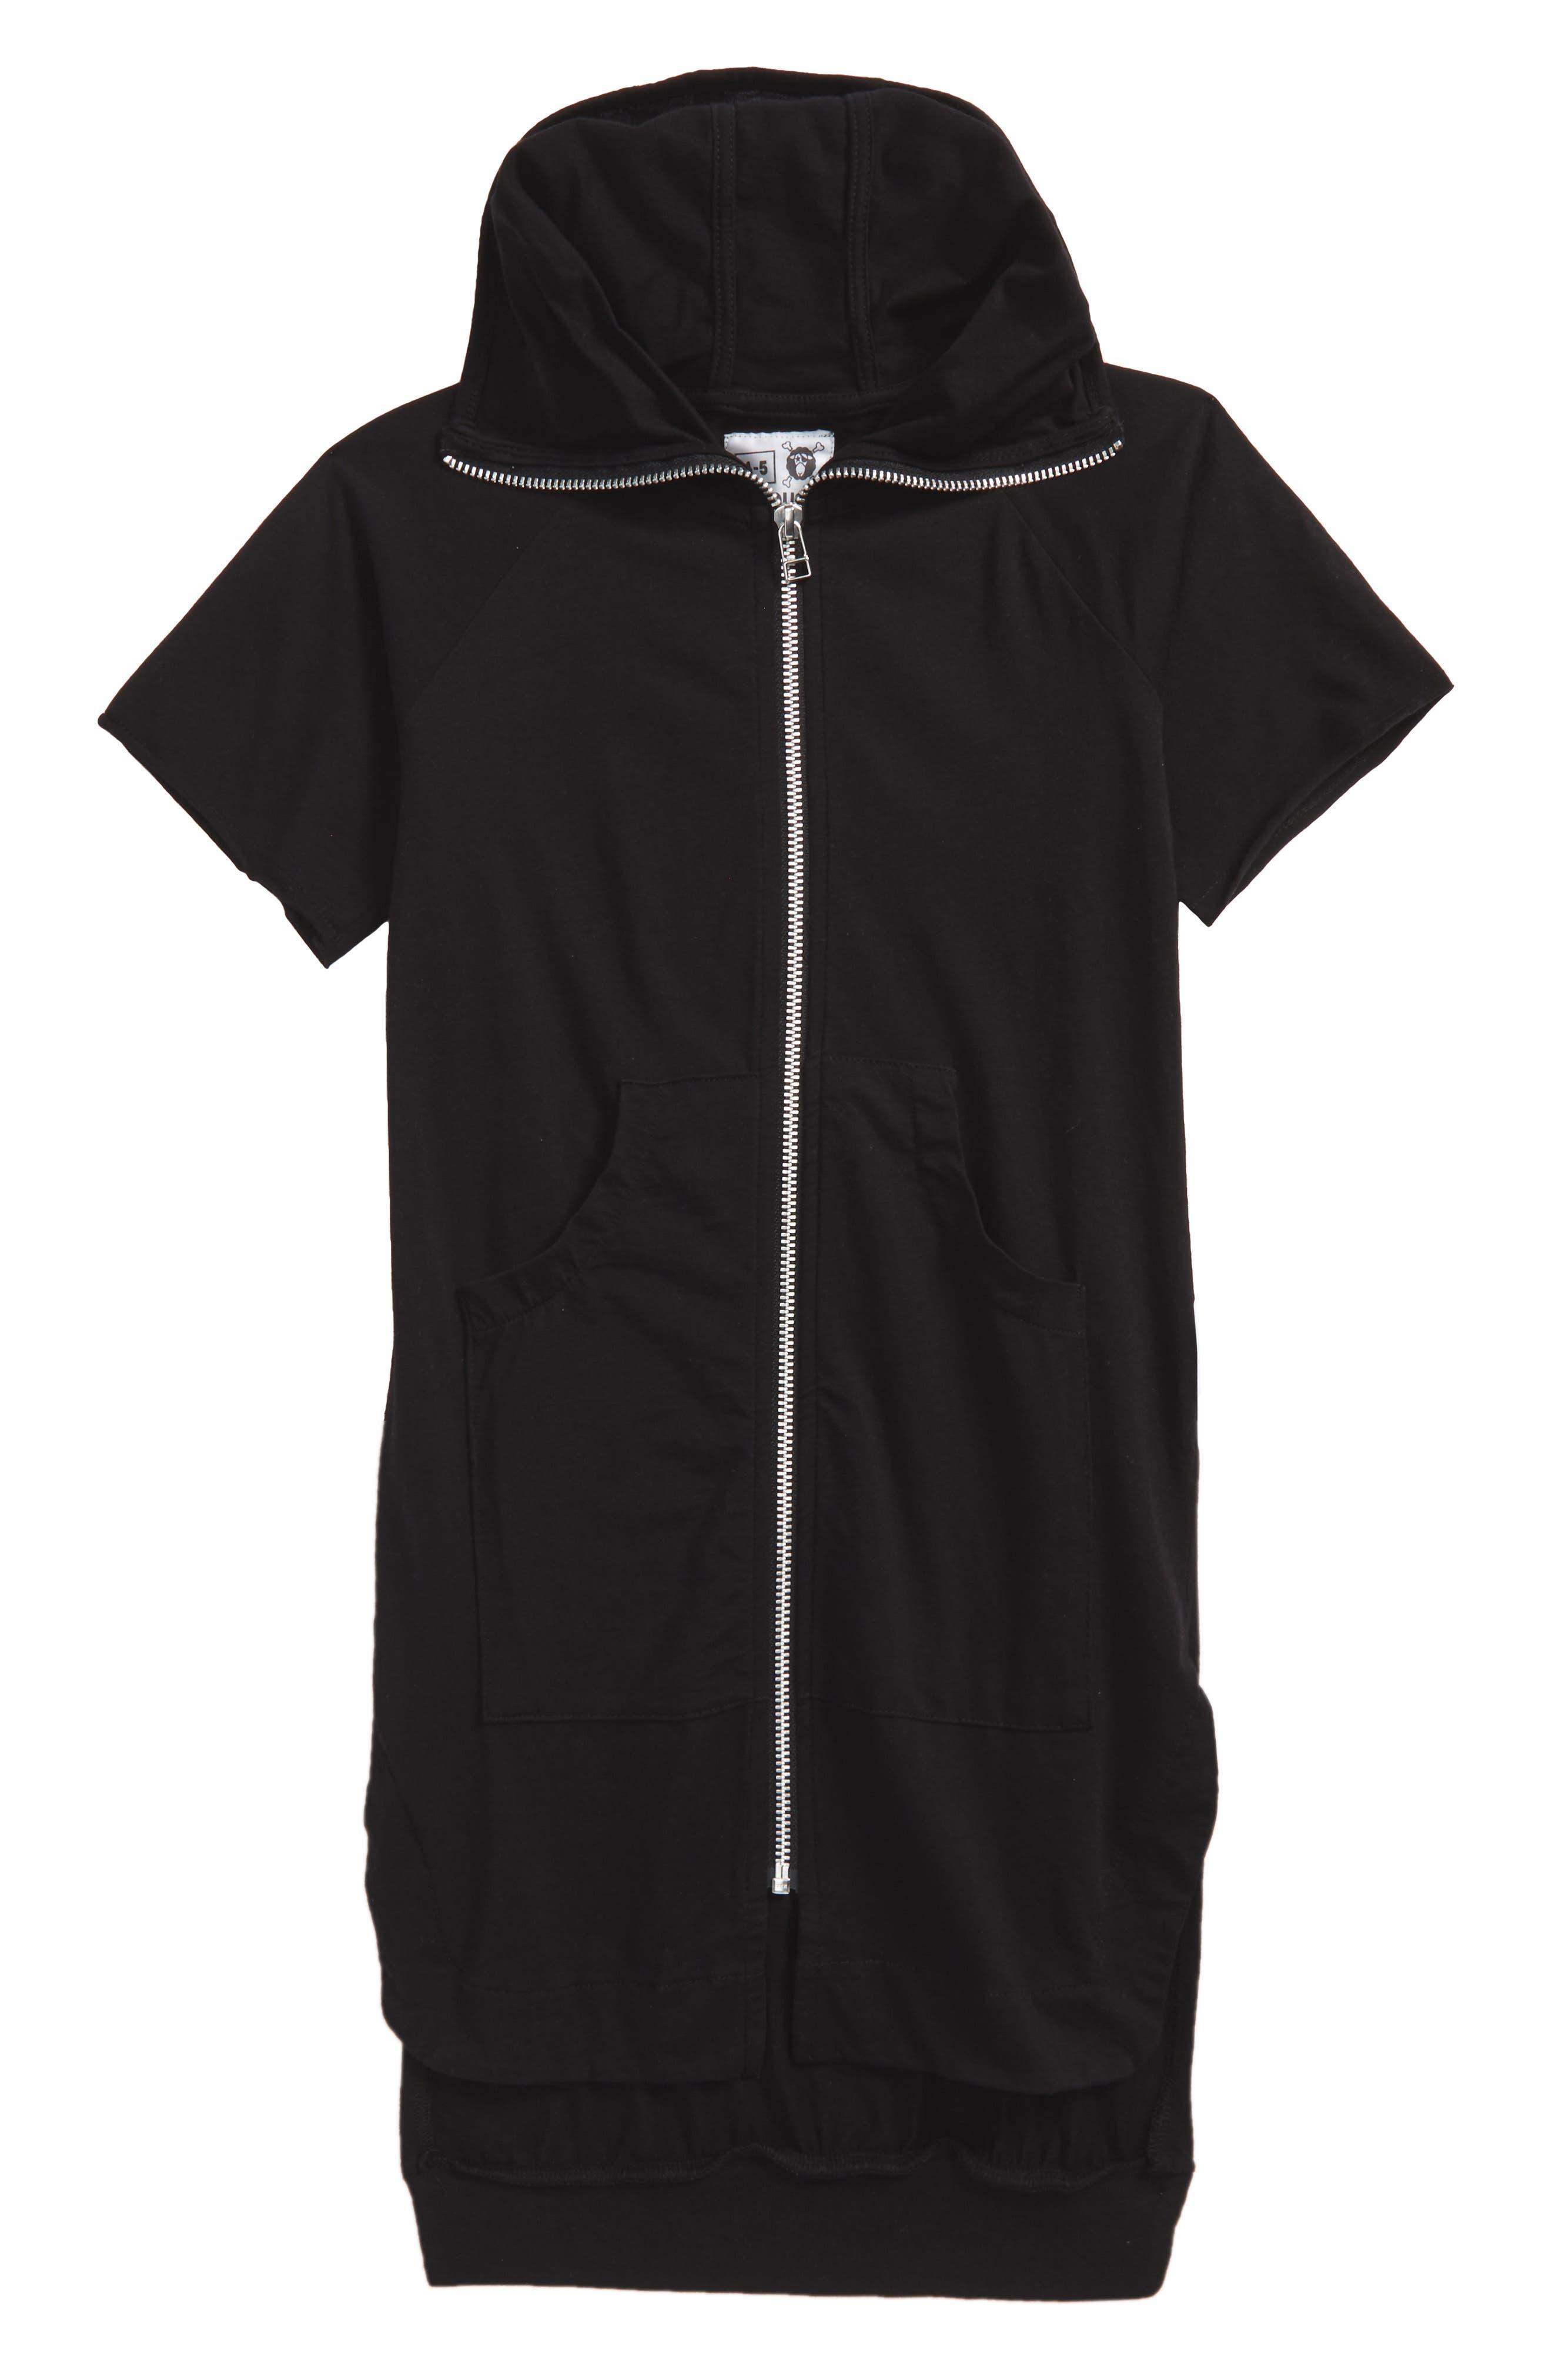 Maxi Short Sleeve Hoodie,                             Main thumbnail 1, color,                             Black